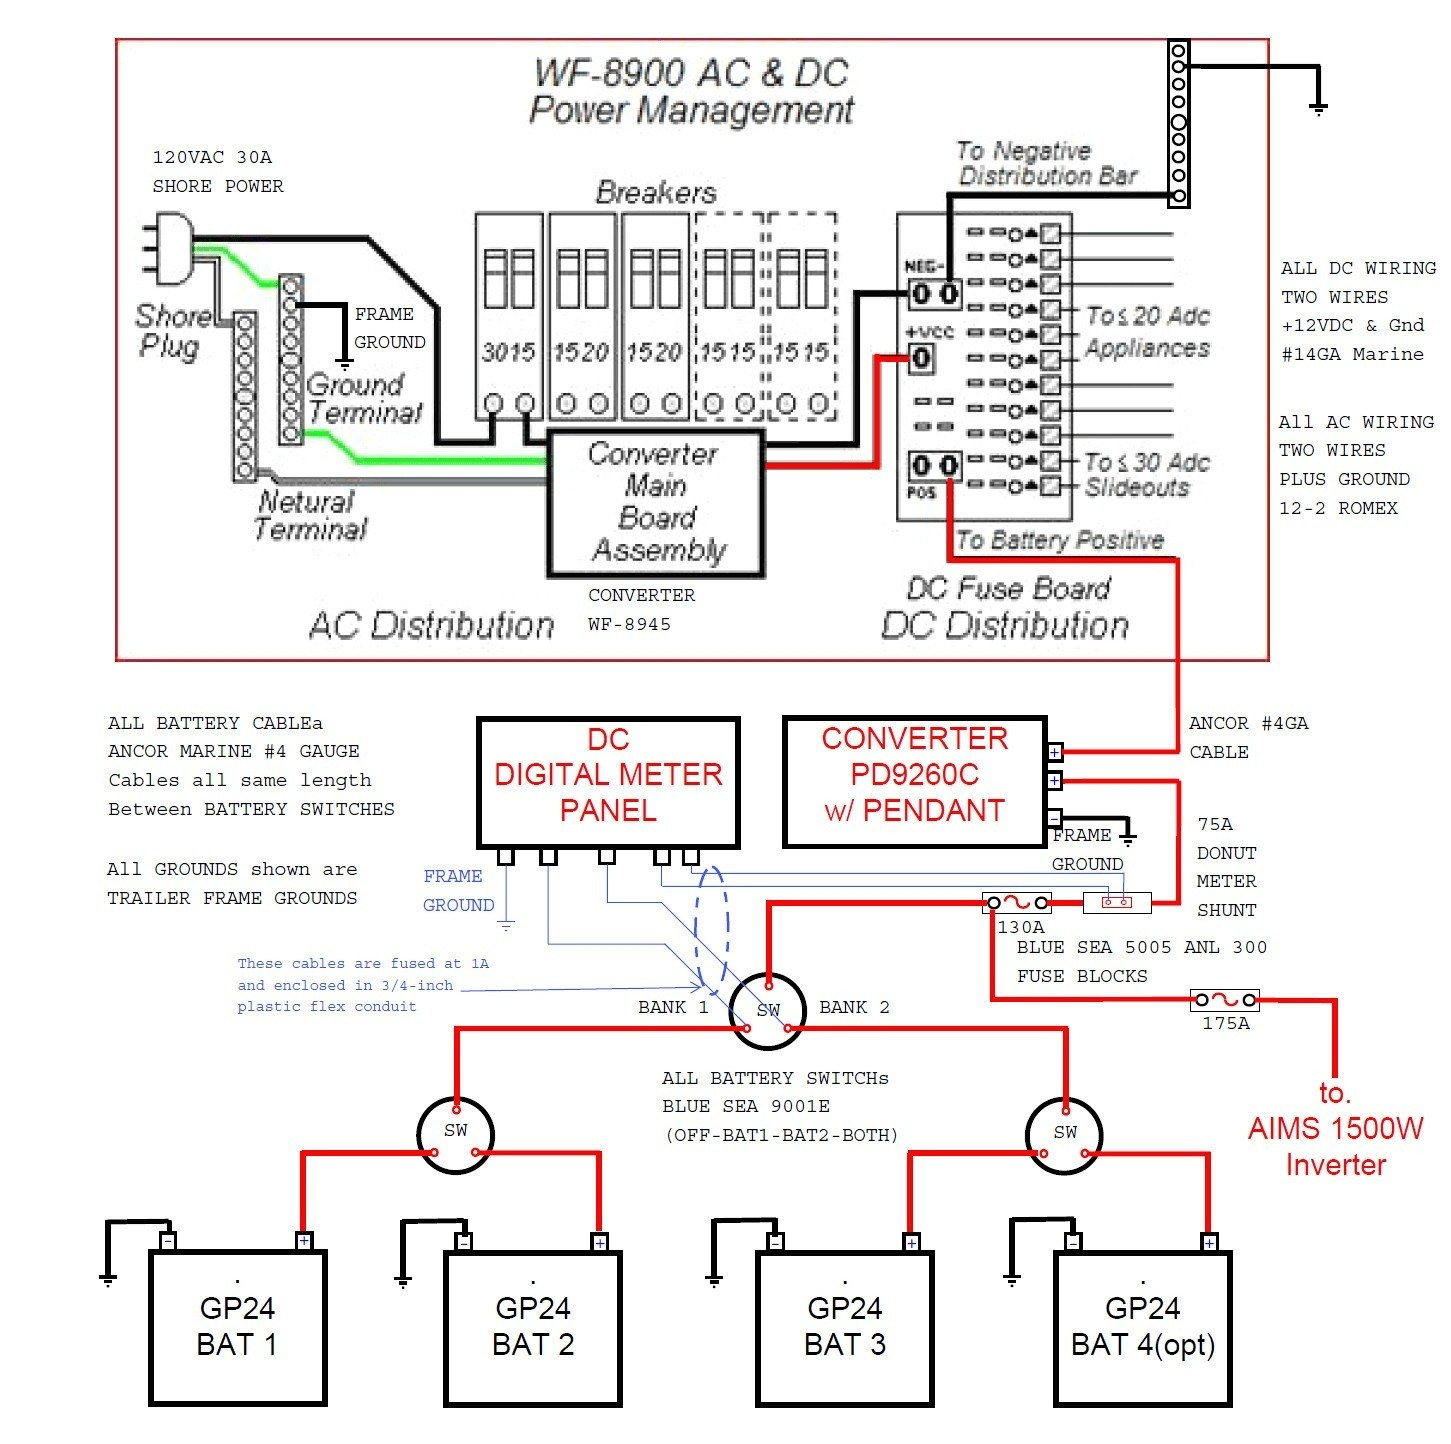 Jayco Battery Wiring Schematic | Wiring Diagram - Travel Trailer Battery Wiring Diagram